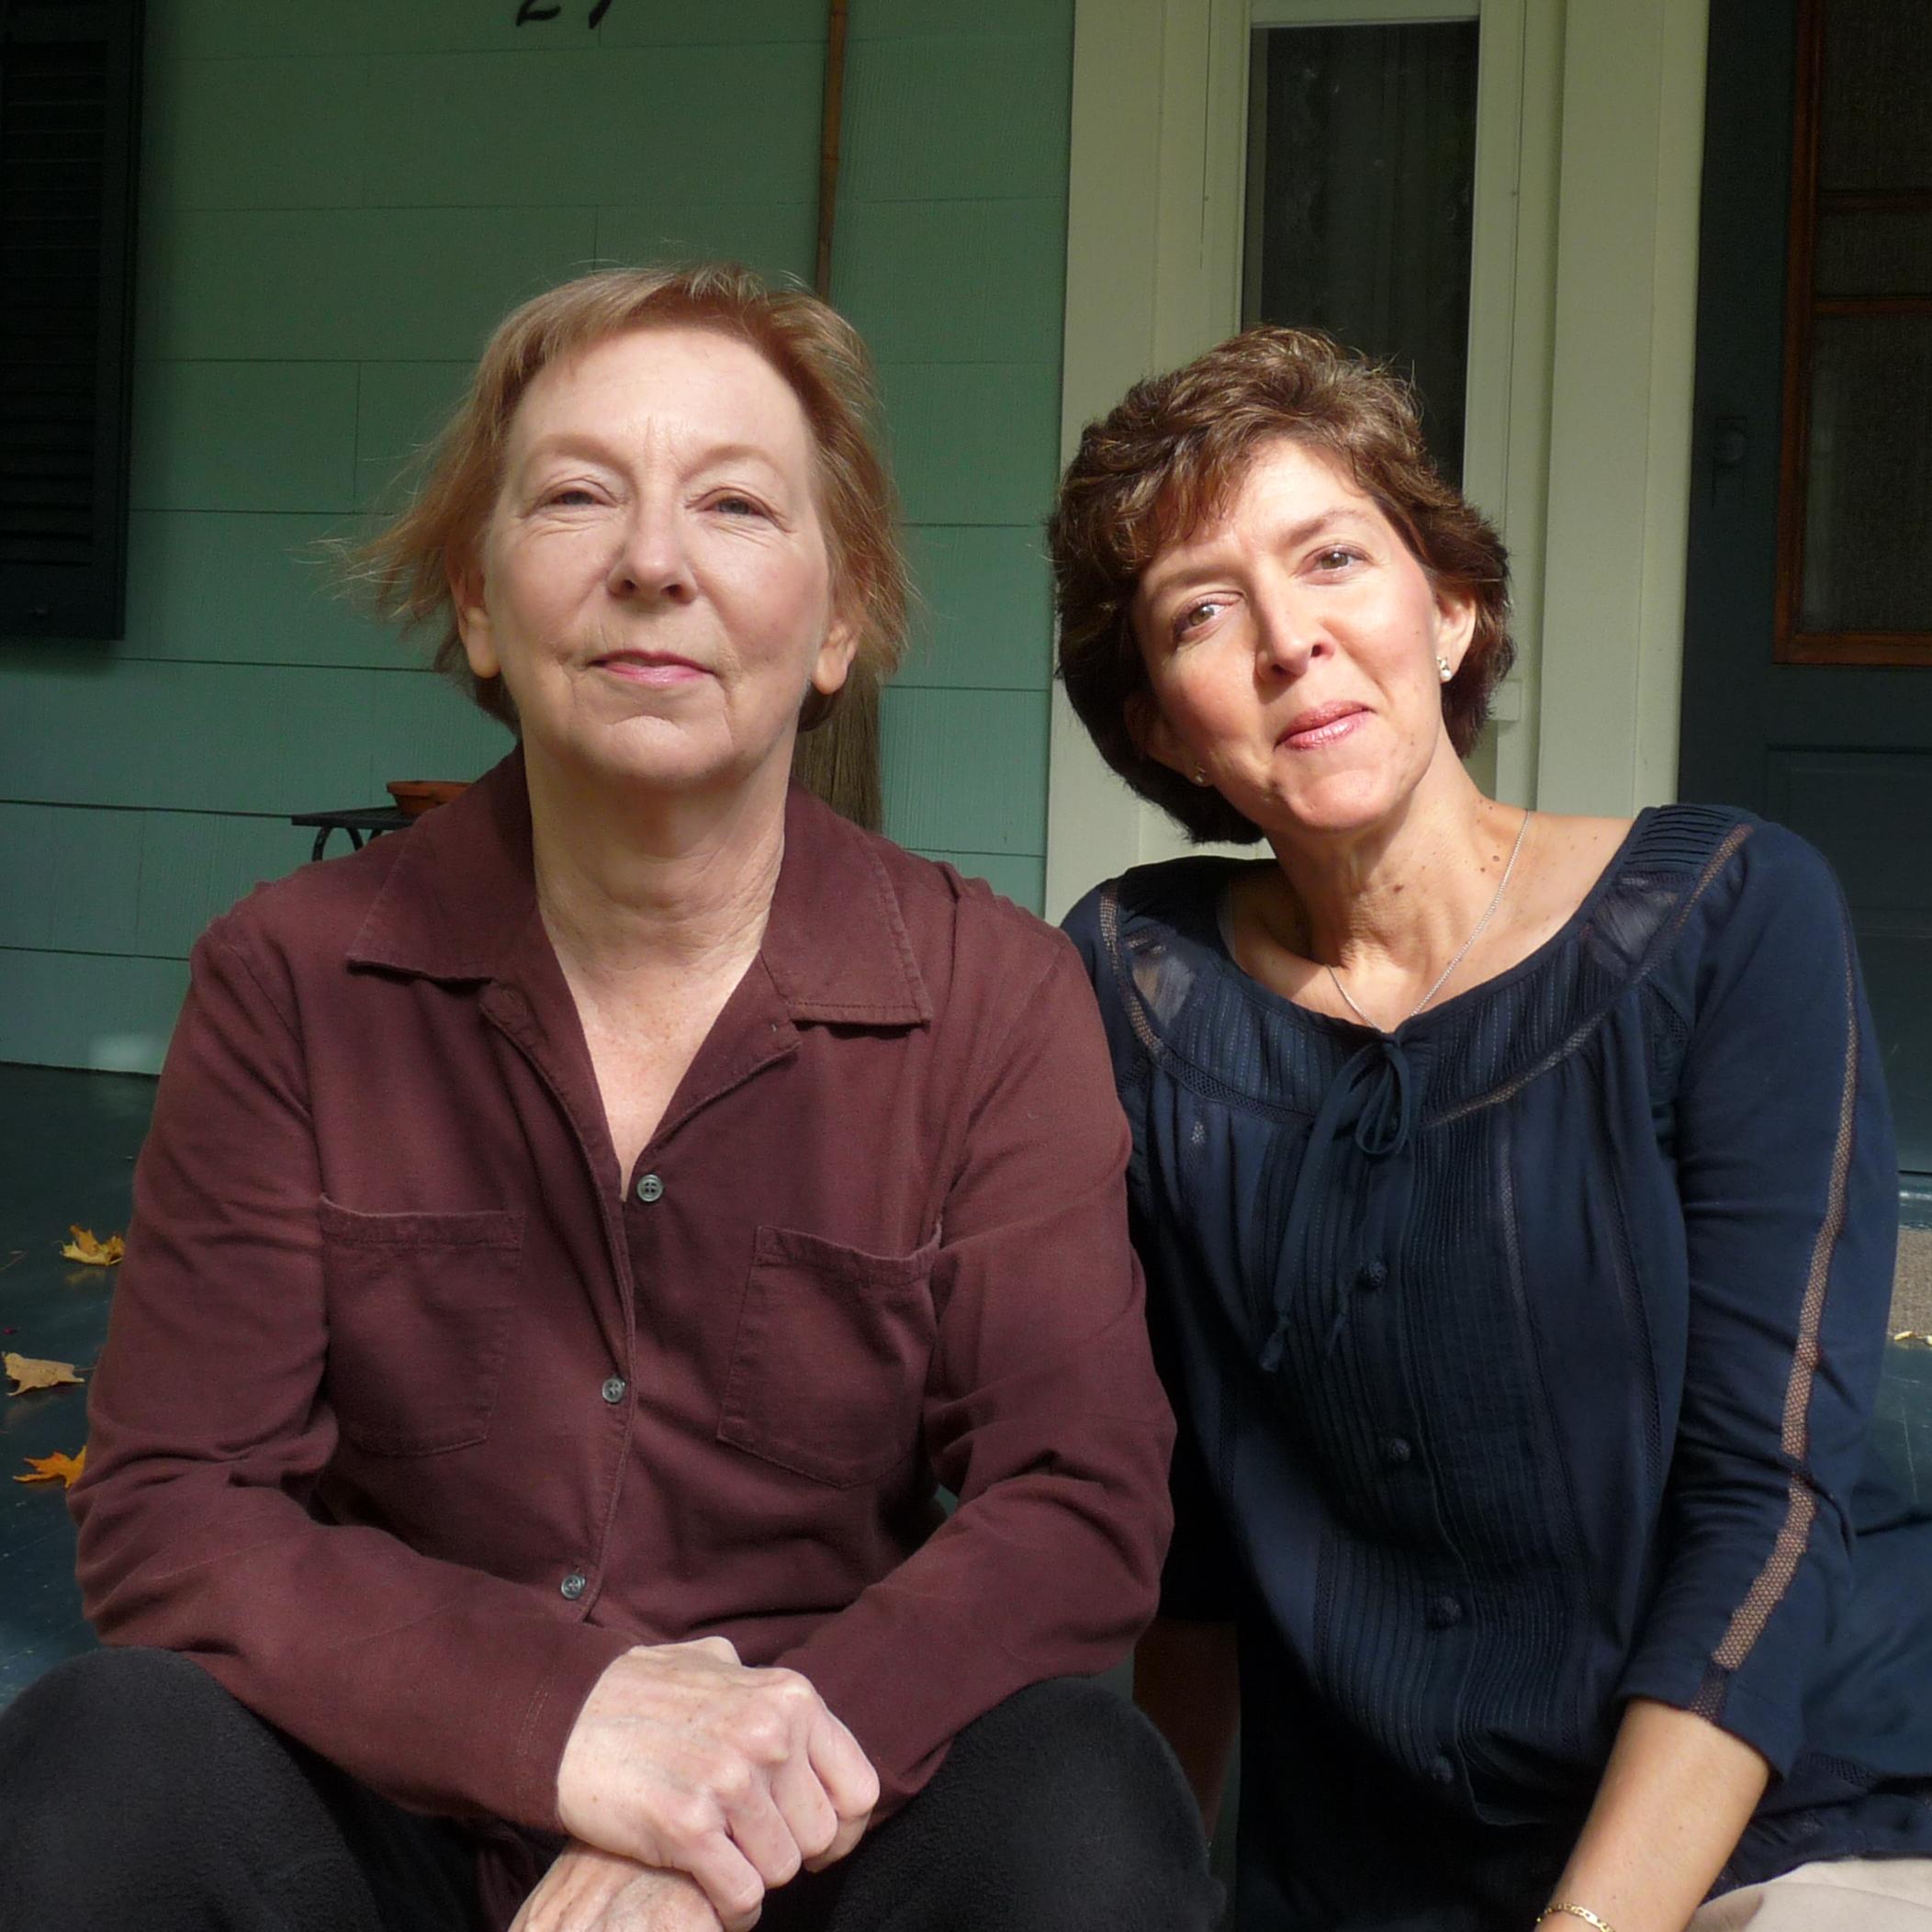 Val and Lisa